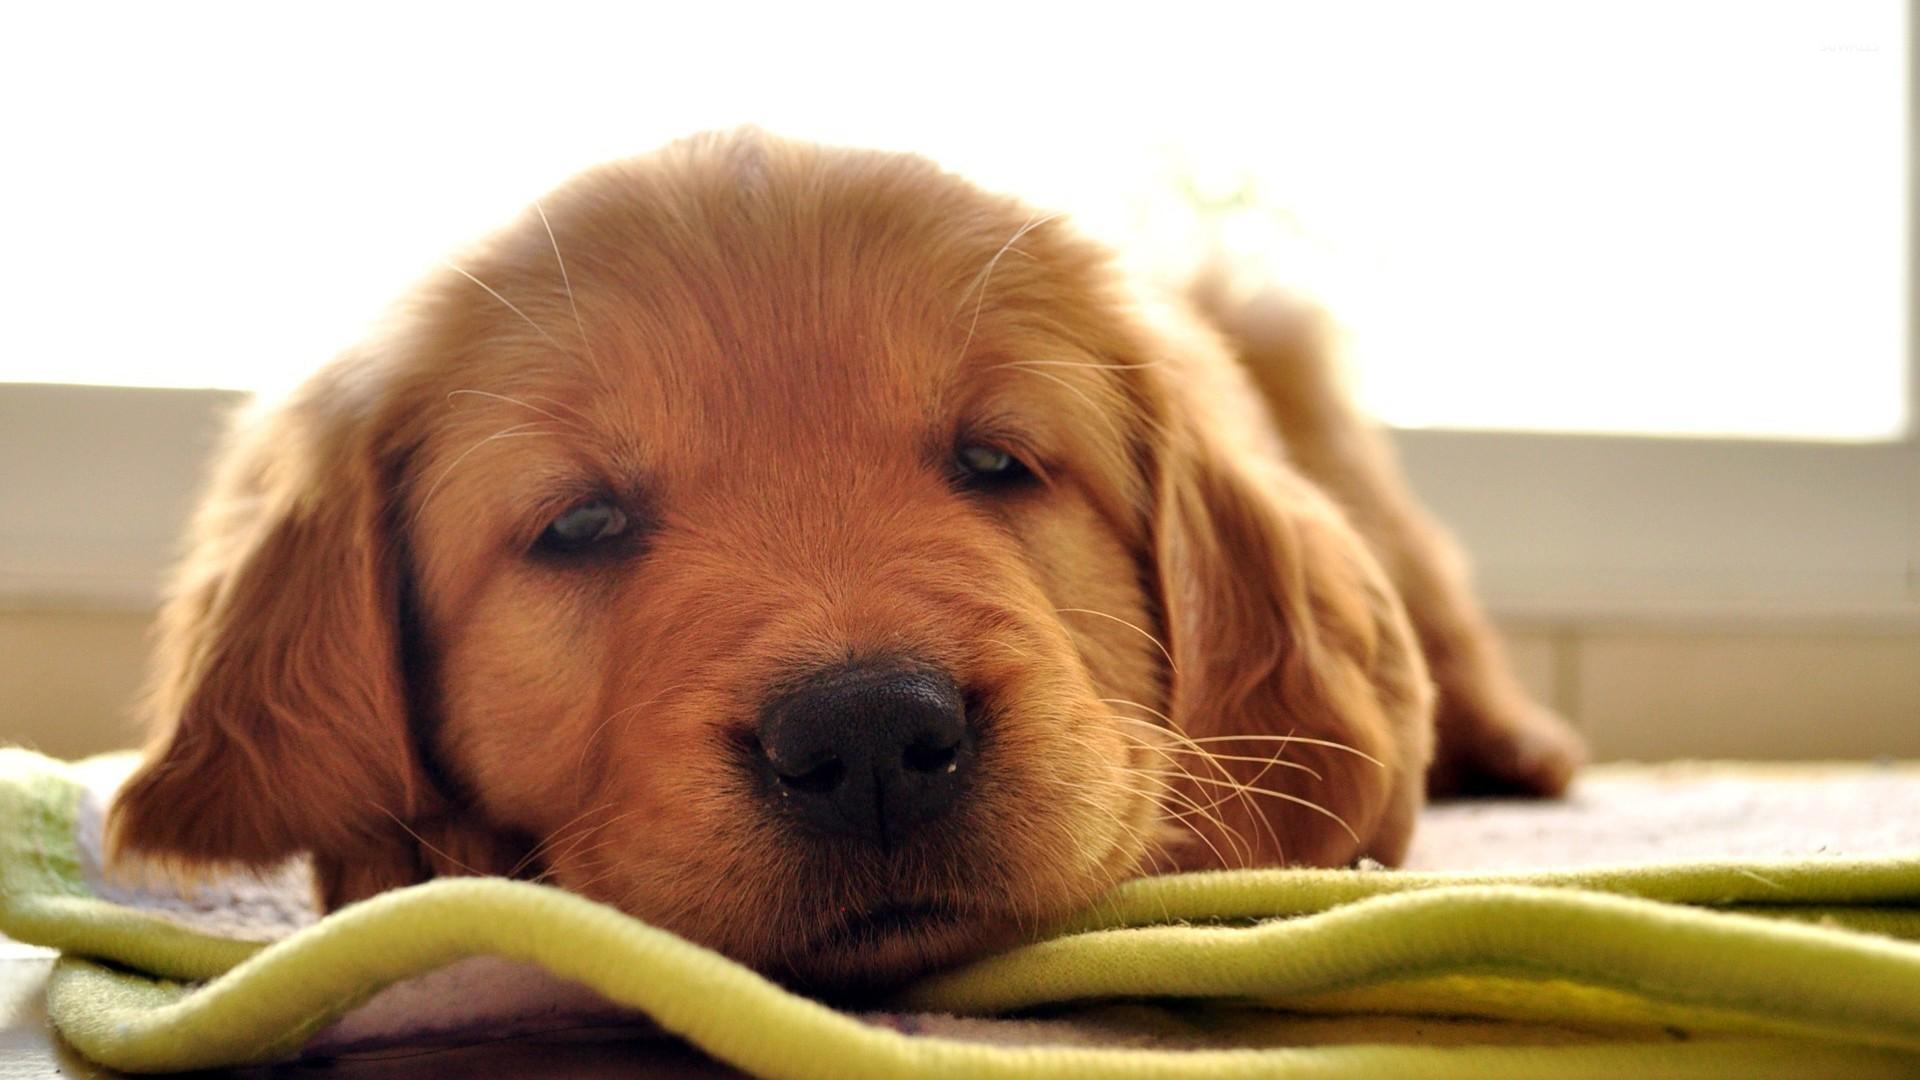 Husky Dog Hd Wallpapers Sleepy Golden Retriever Puppy Wallpaper Animal